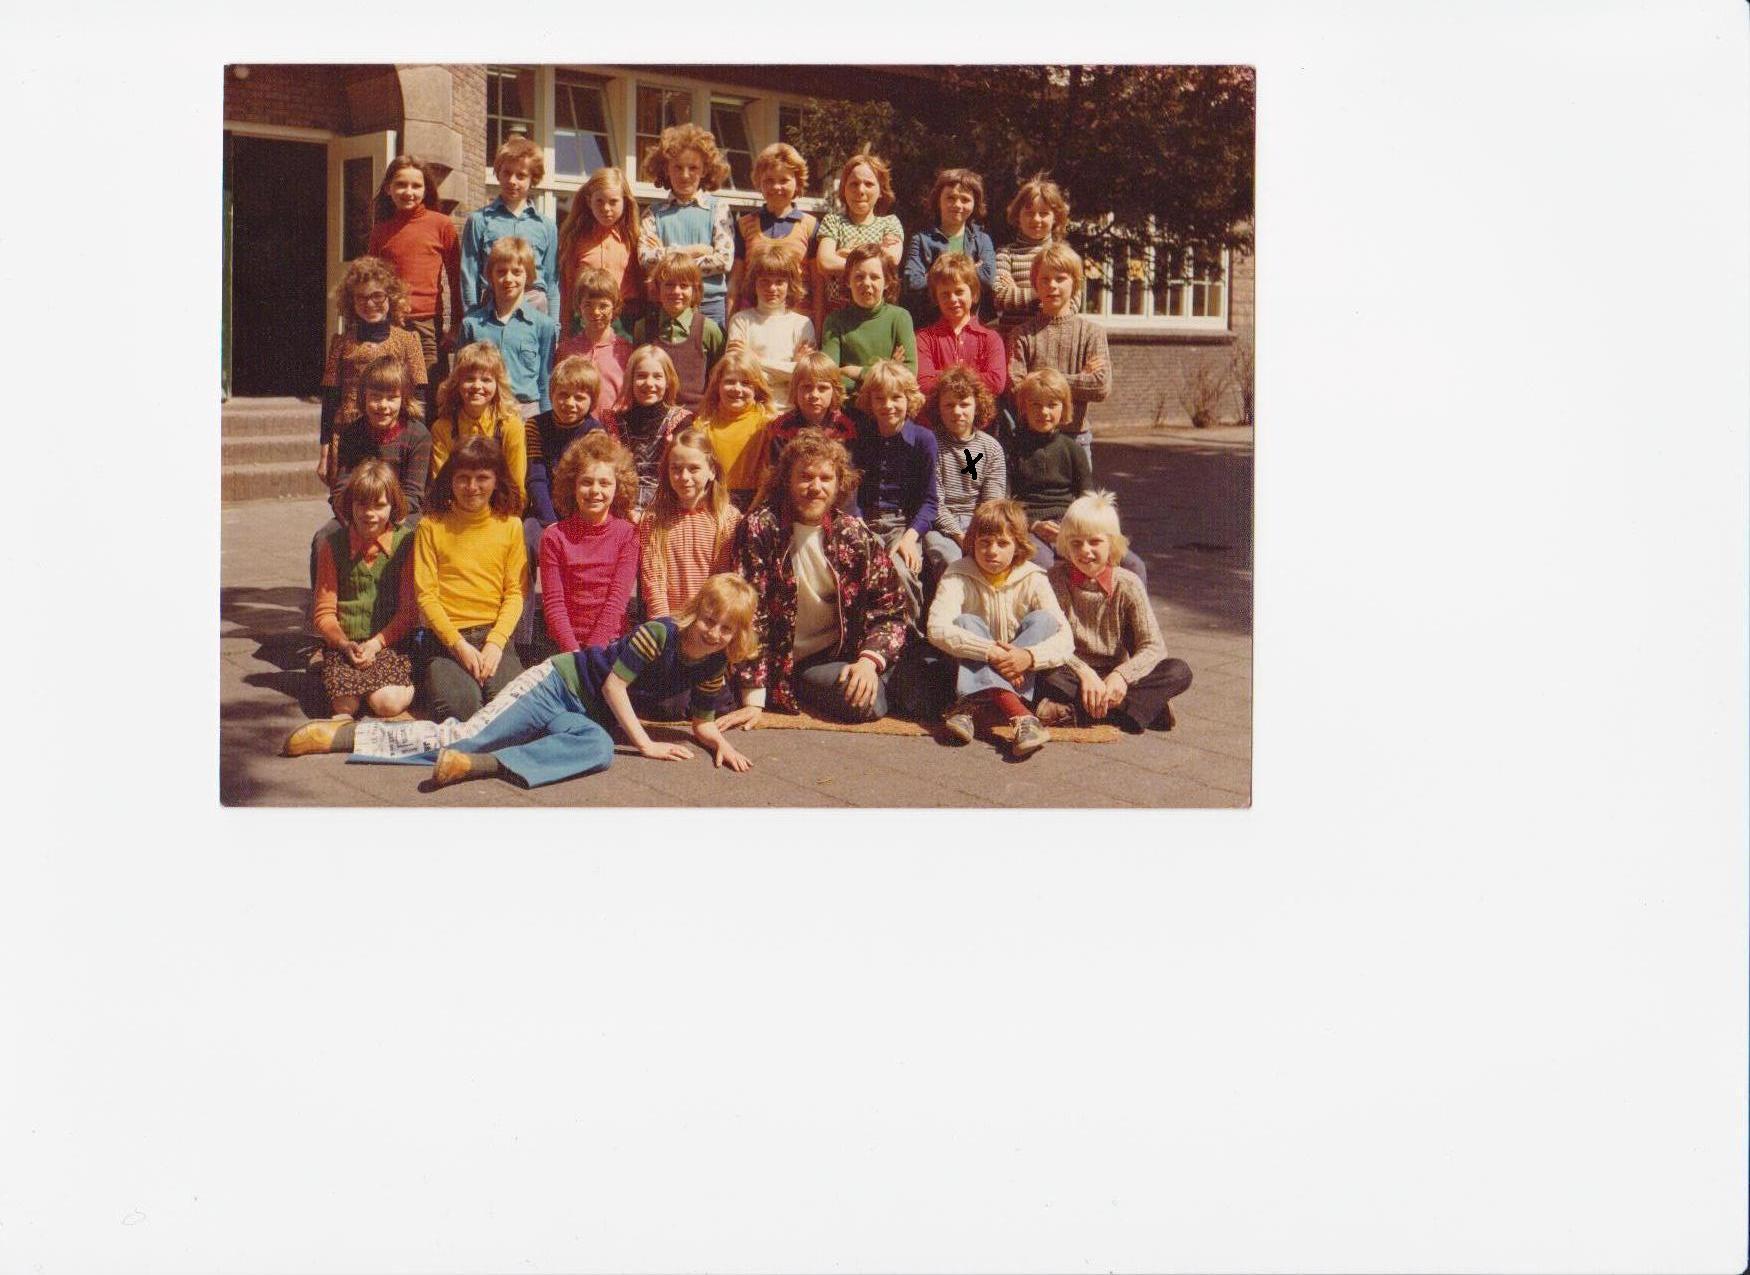 De Duinjagerschool foto